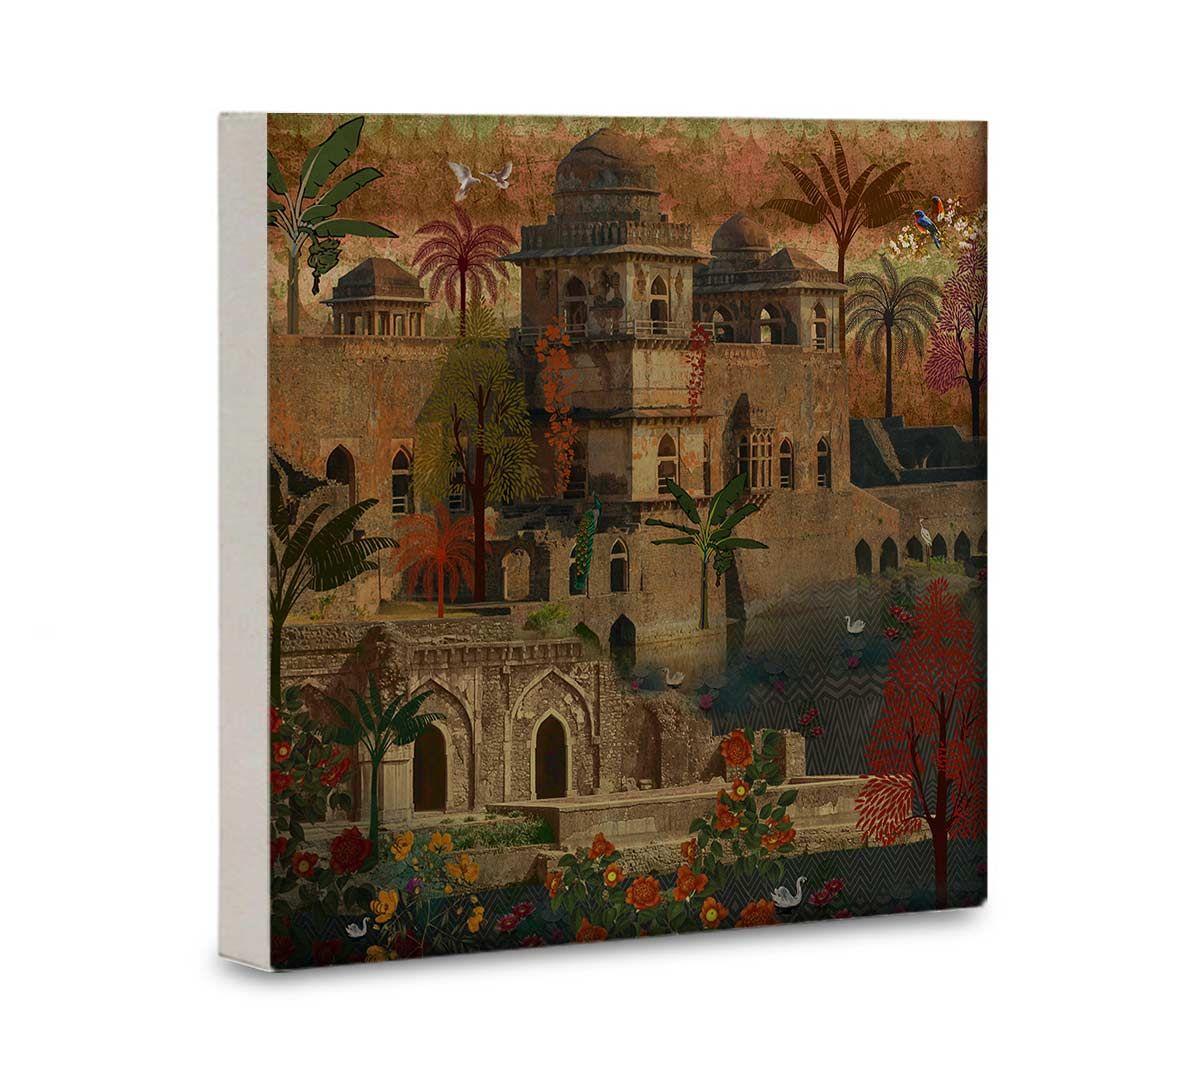 India Circus Ship Palace 16x16 and 24x24 Canvas Wall Art